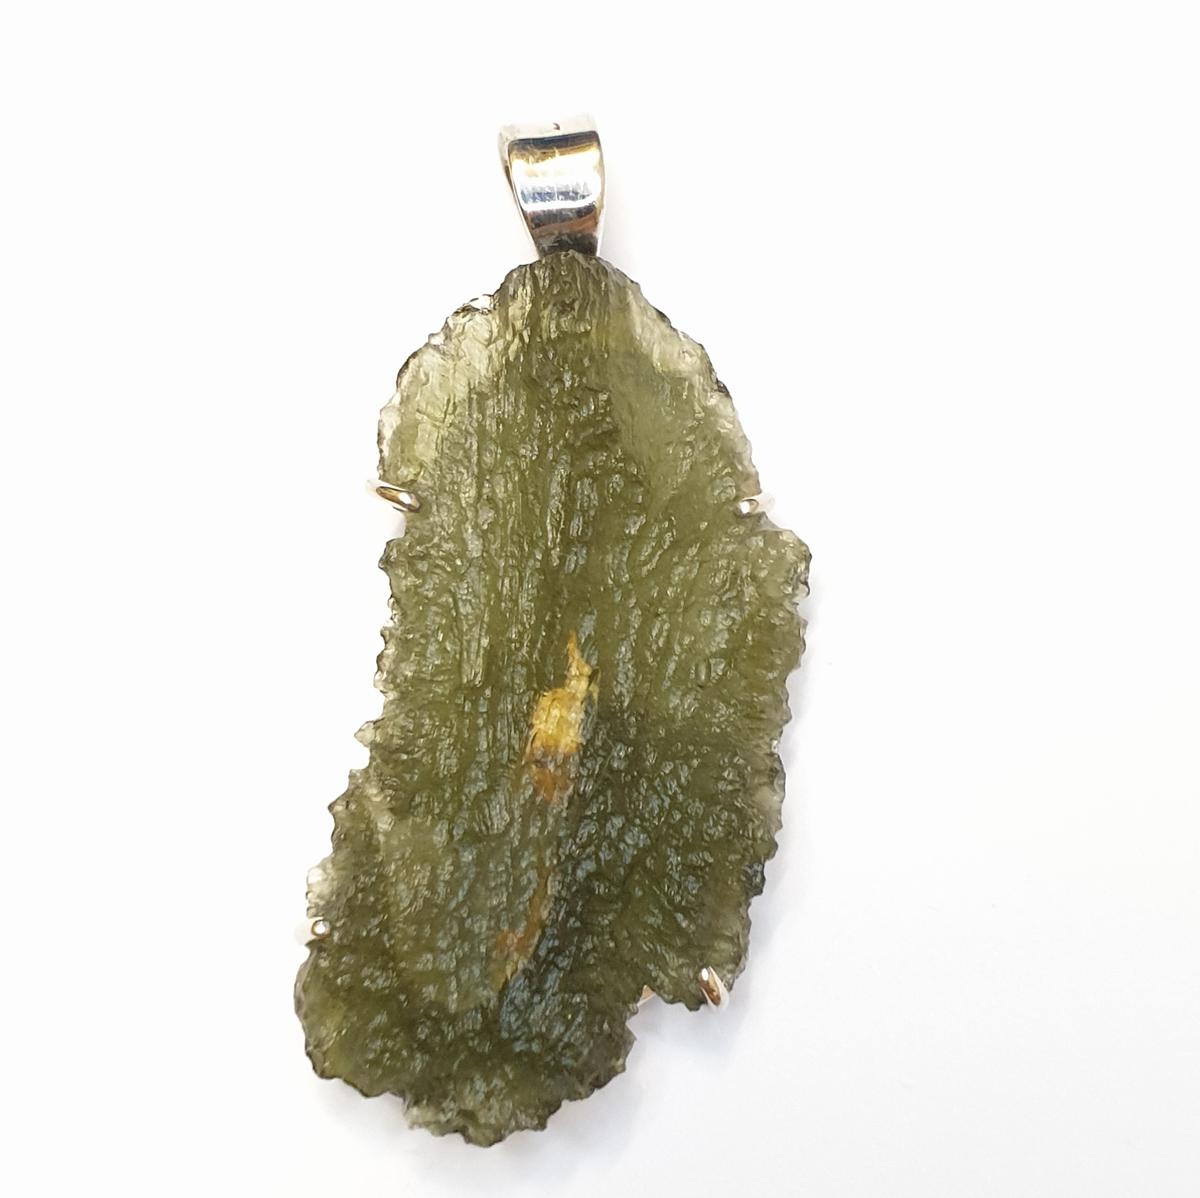 large-natural-raw-oval-moldavite-meterorite-pendant-72-a